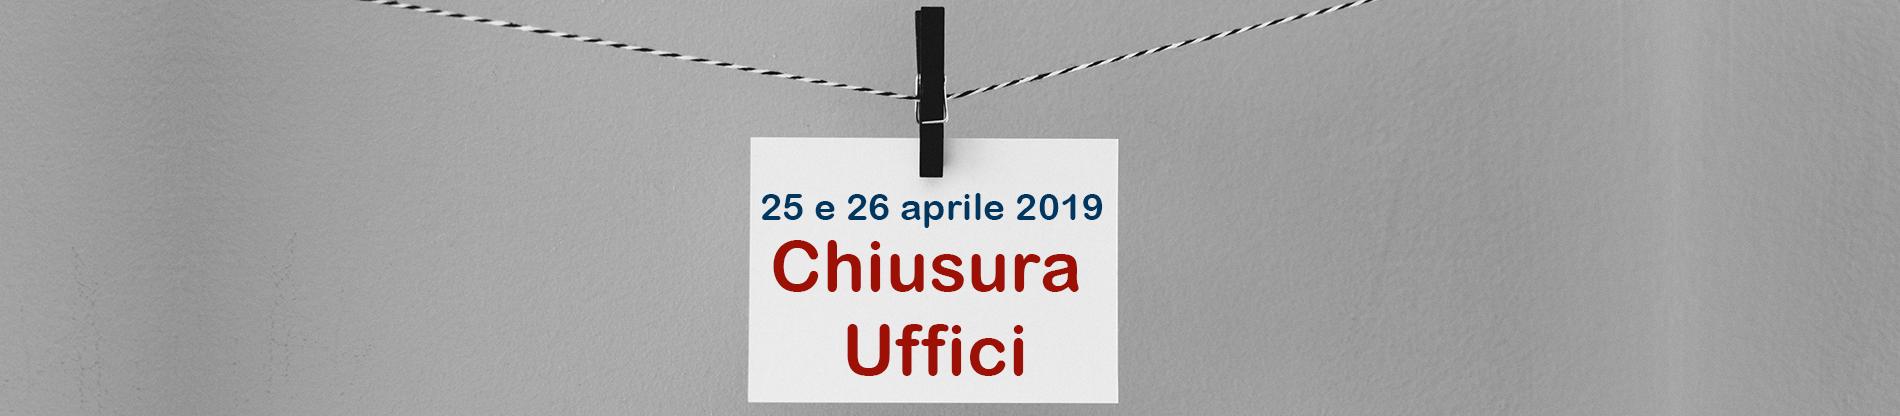 chiusura_uffici_25_26_aprile_slider